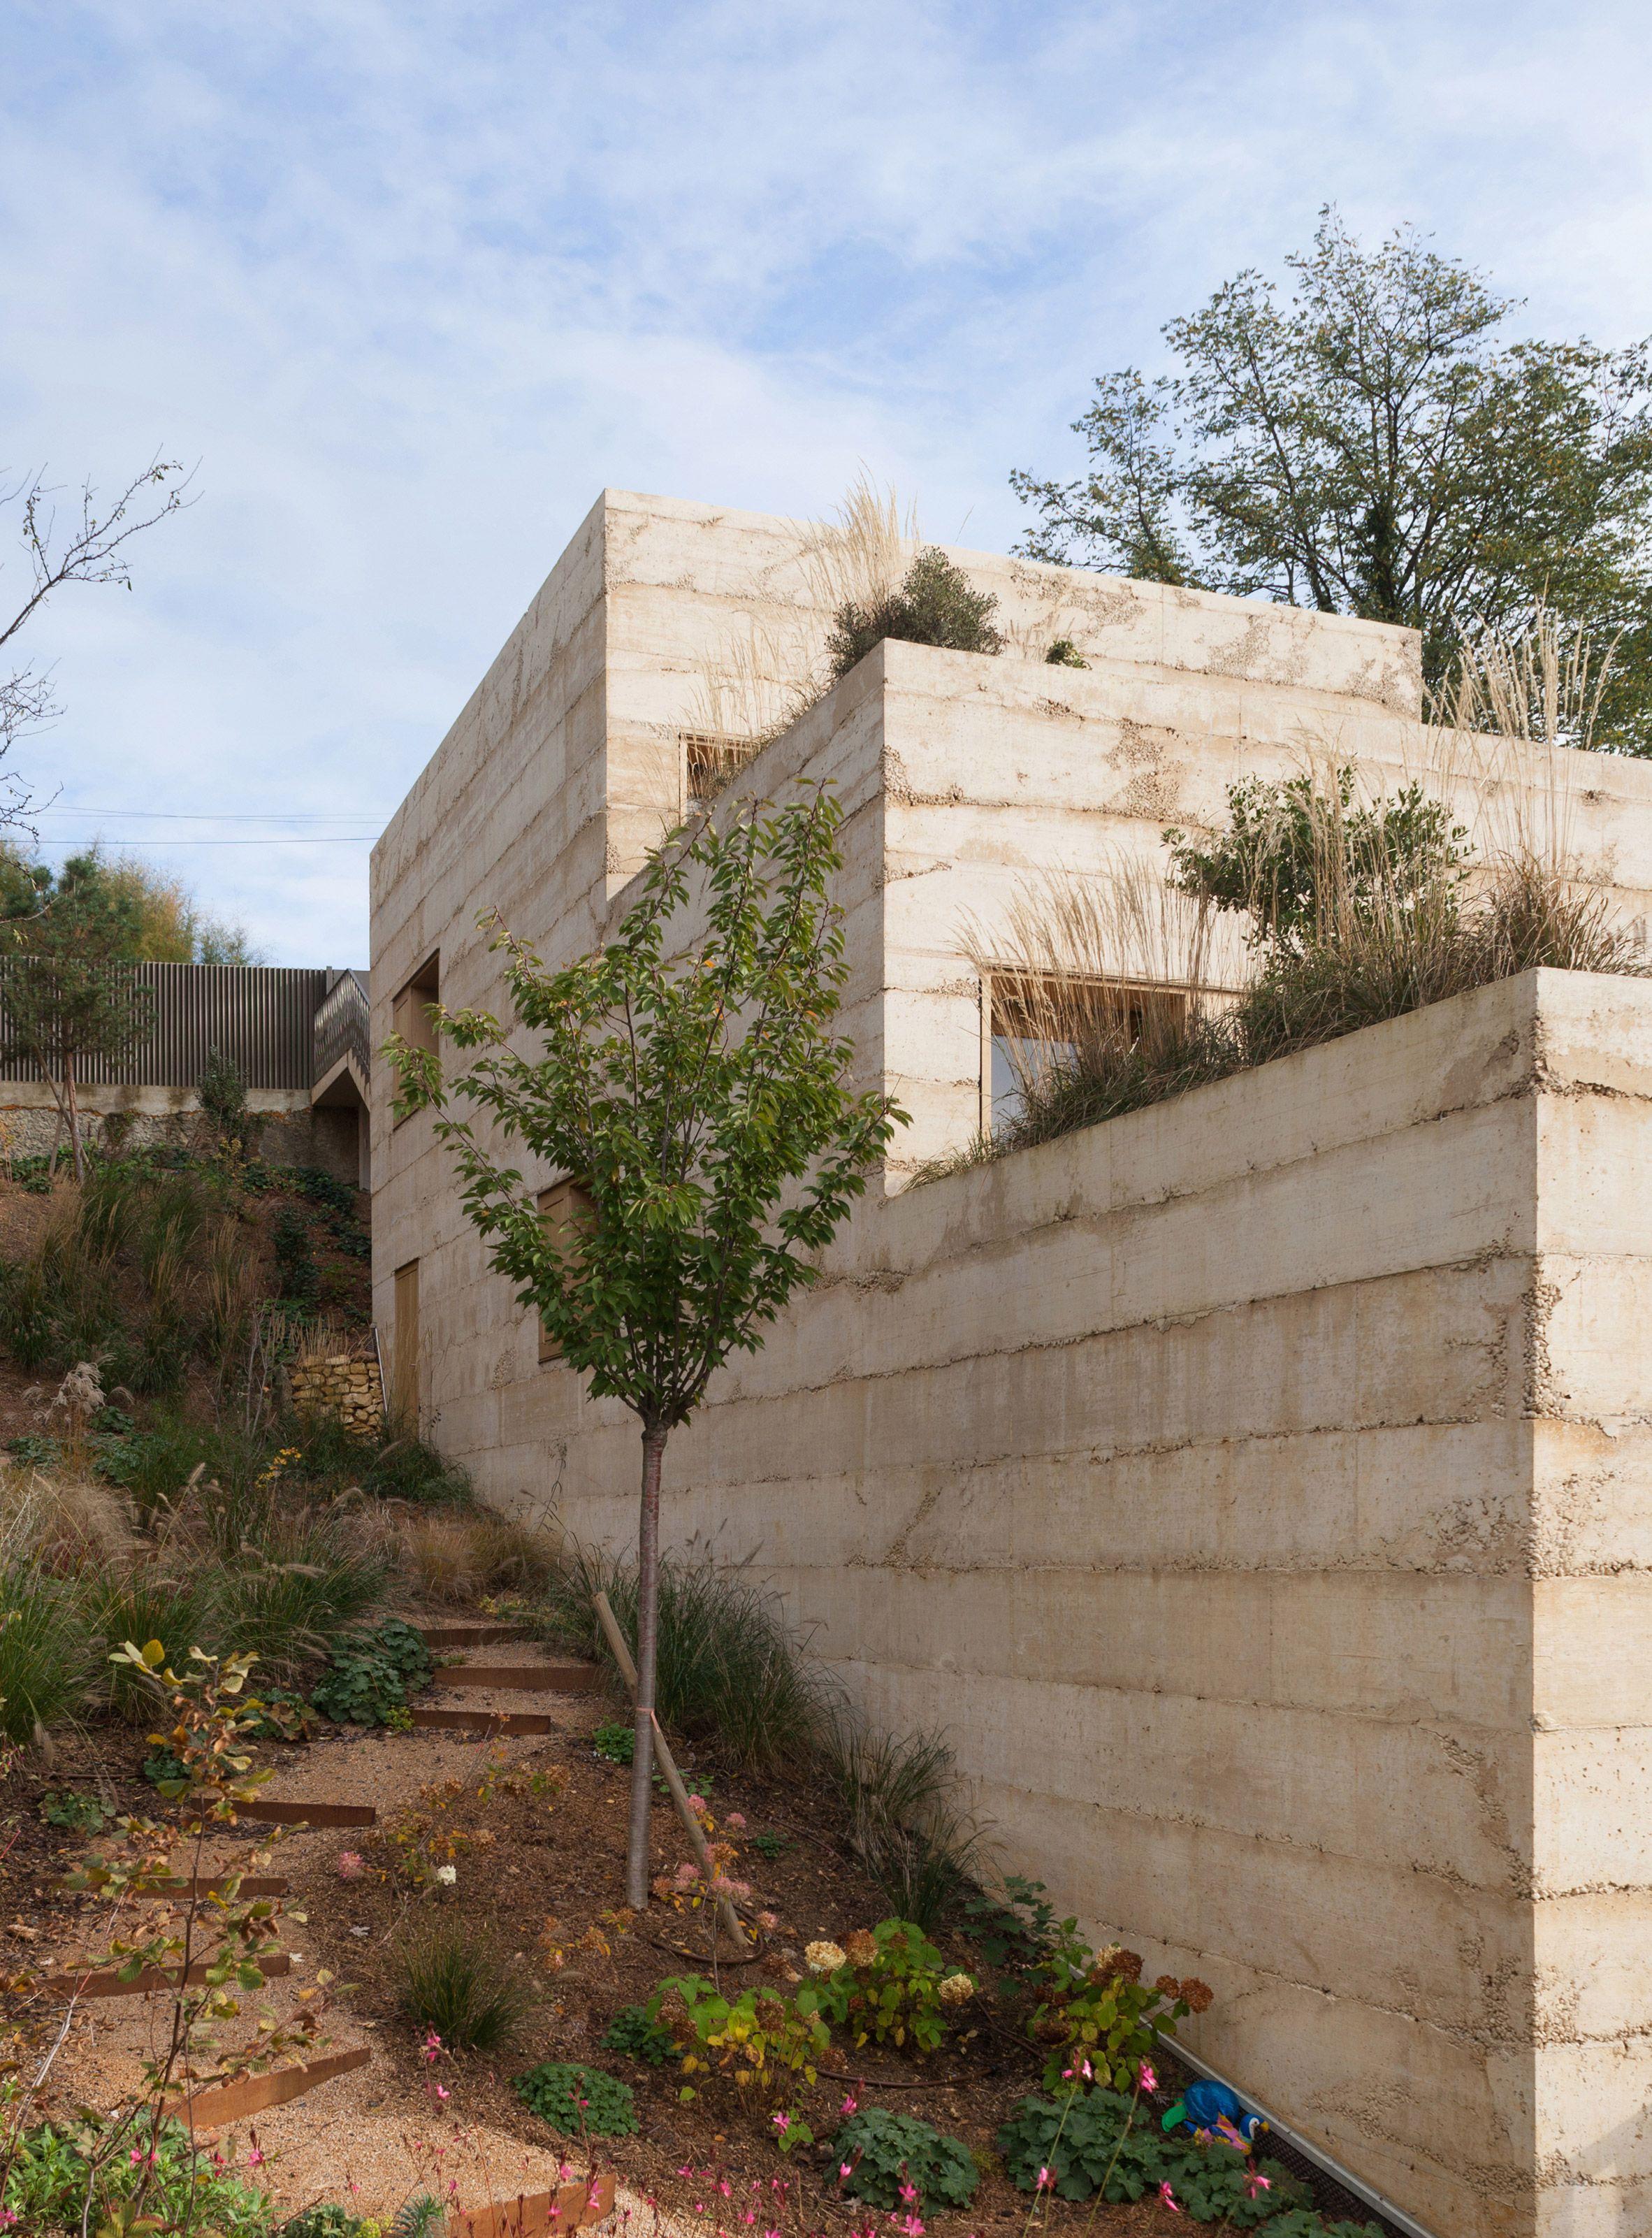 Tectoniques Sets Ochre Coloured Concrete House Into French Hillside In 2020 Concrete House Concrete Wall Interior Design Larch Cladding